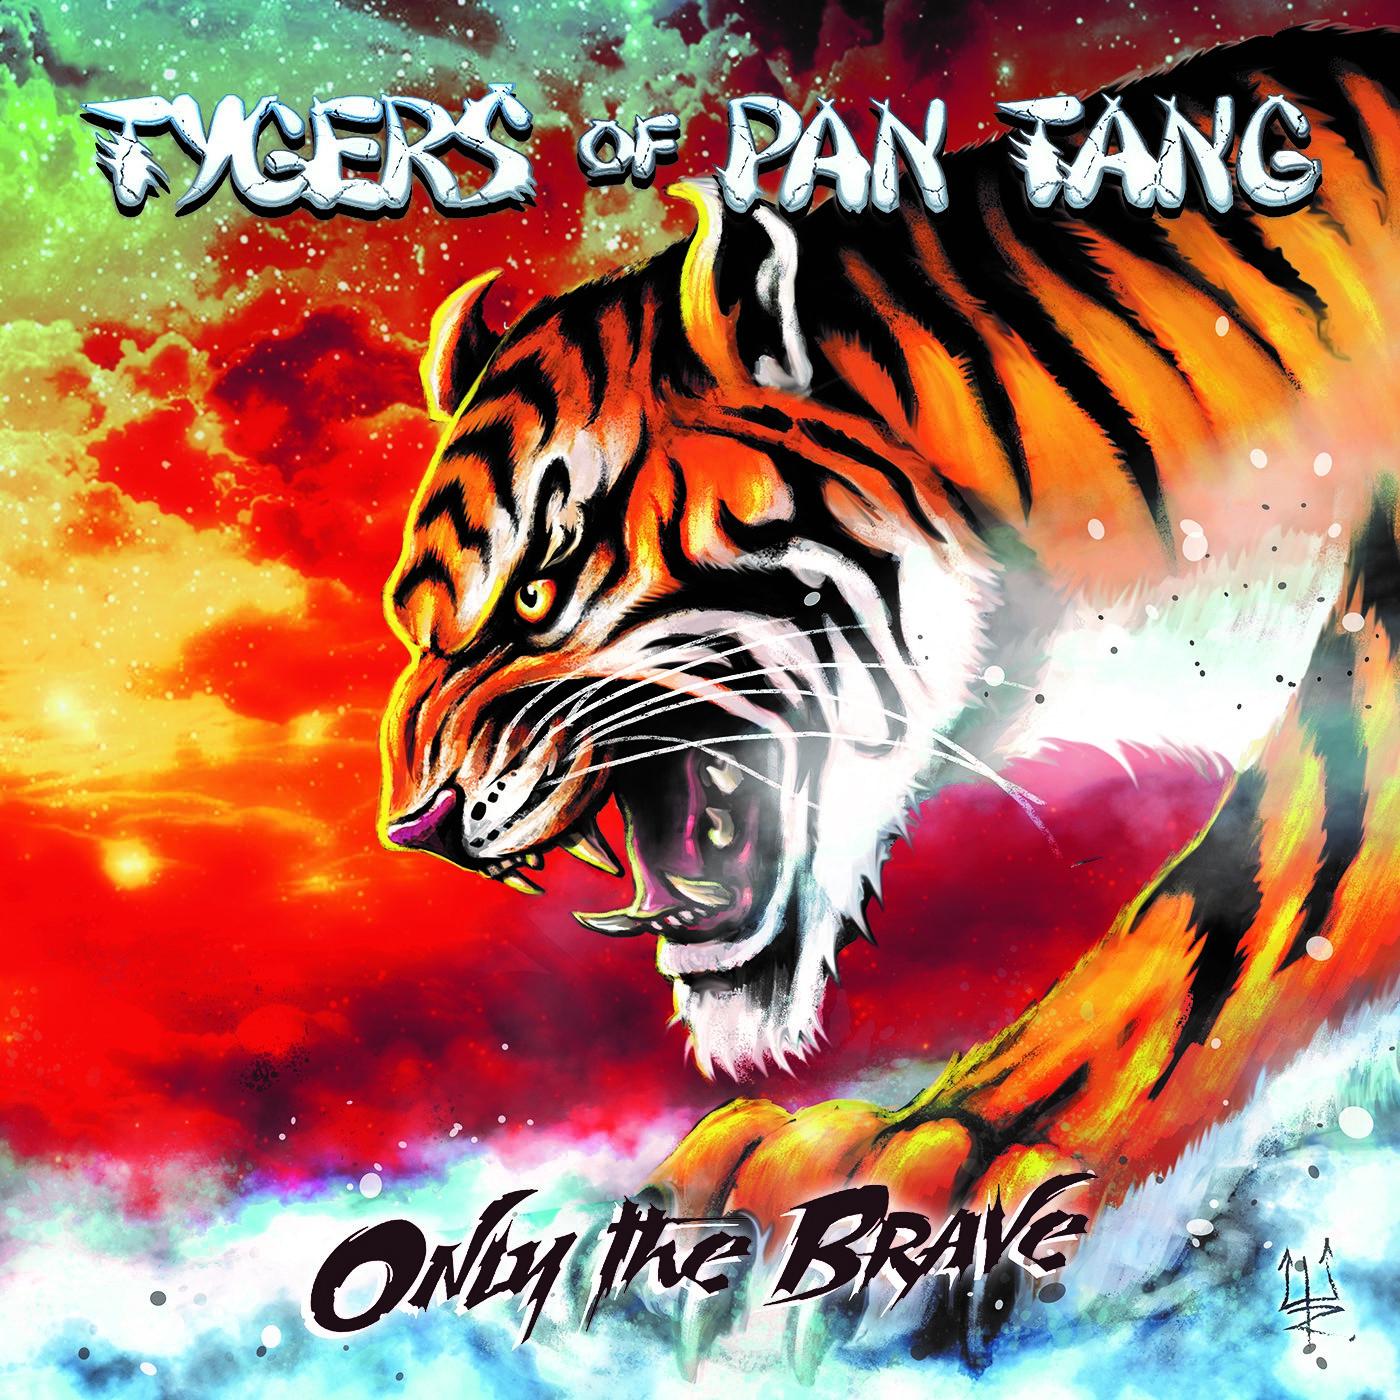 tygers of pan tang album covers